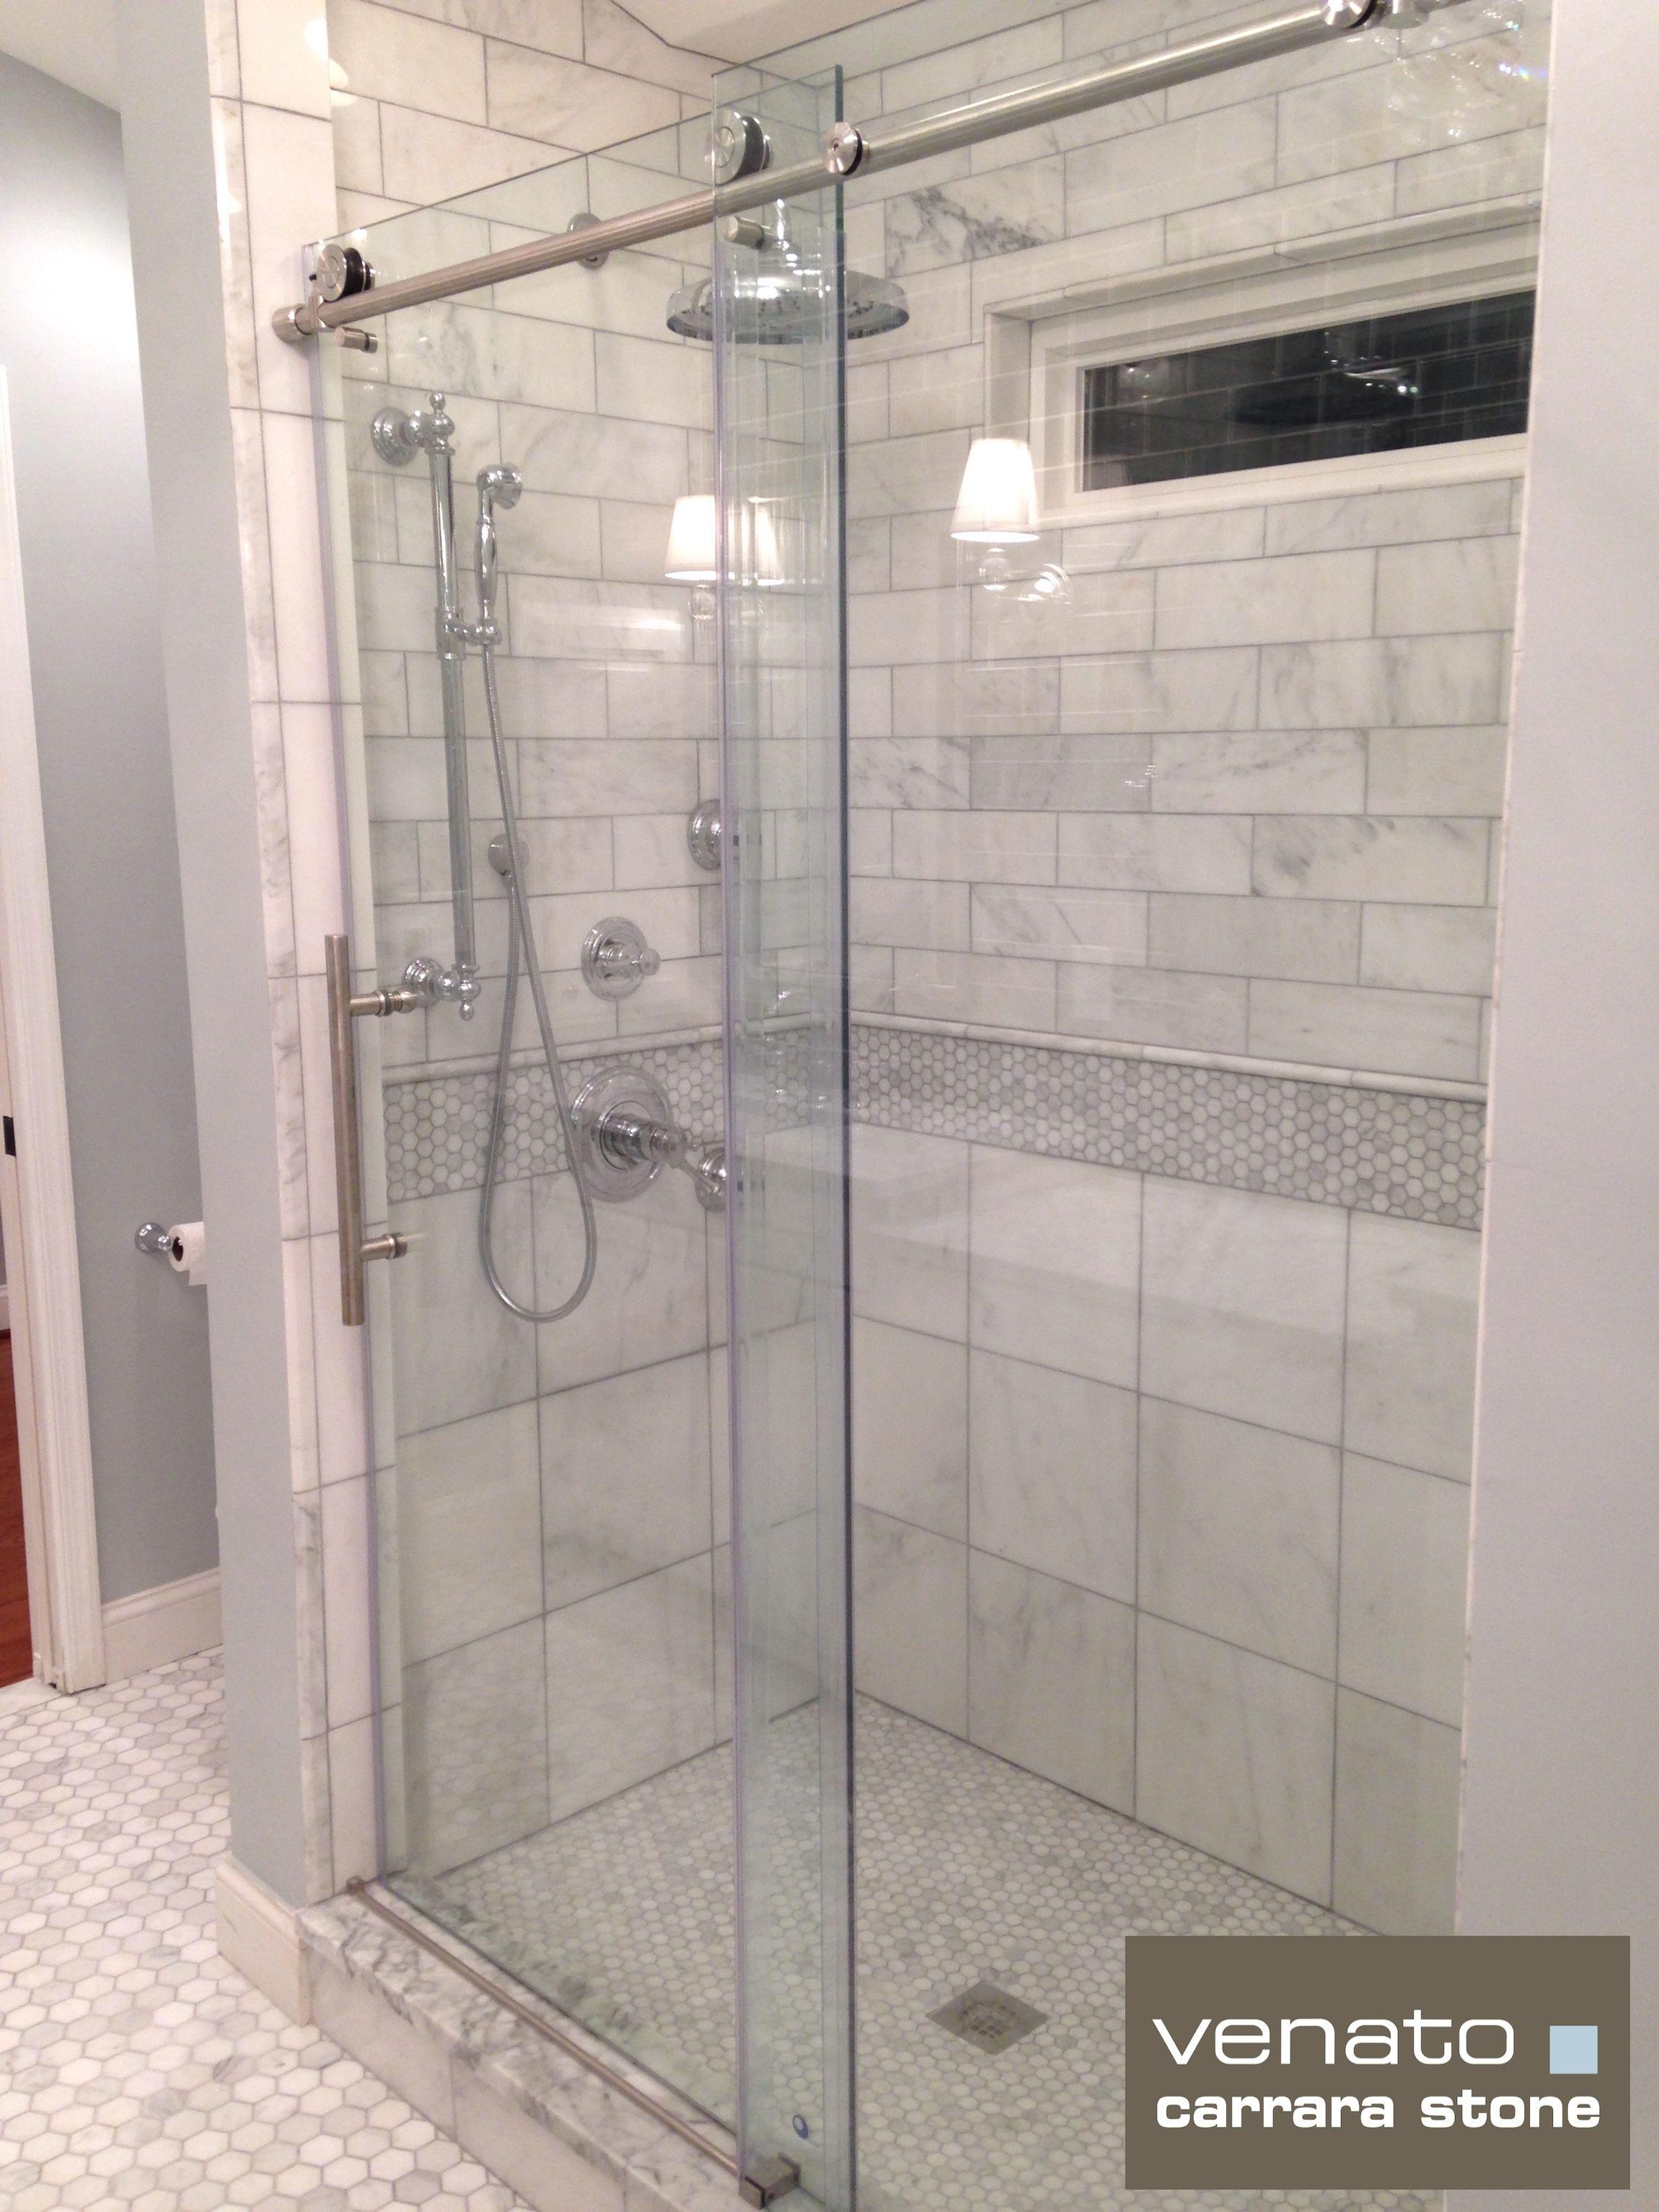 carrara tile bathroom. Subway Tiles In Attic Bathroom   Carrara Venato 4×12\u2033 Tile Polished $8.00 H